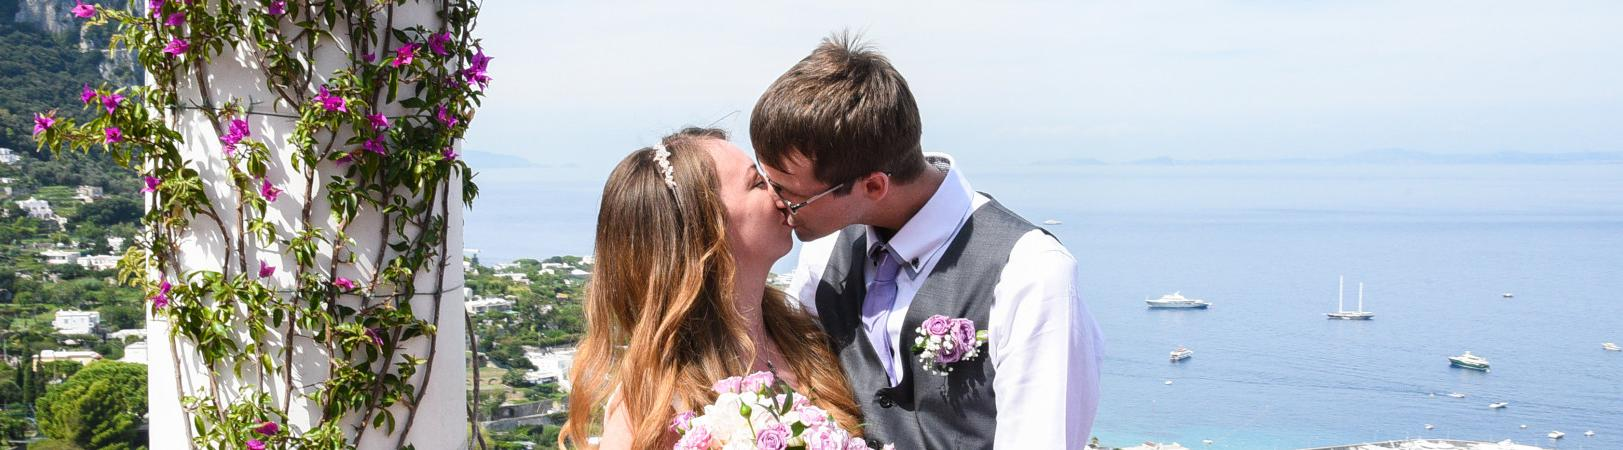 Weddings in Capri